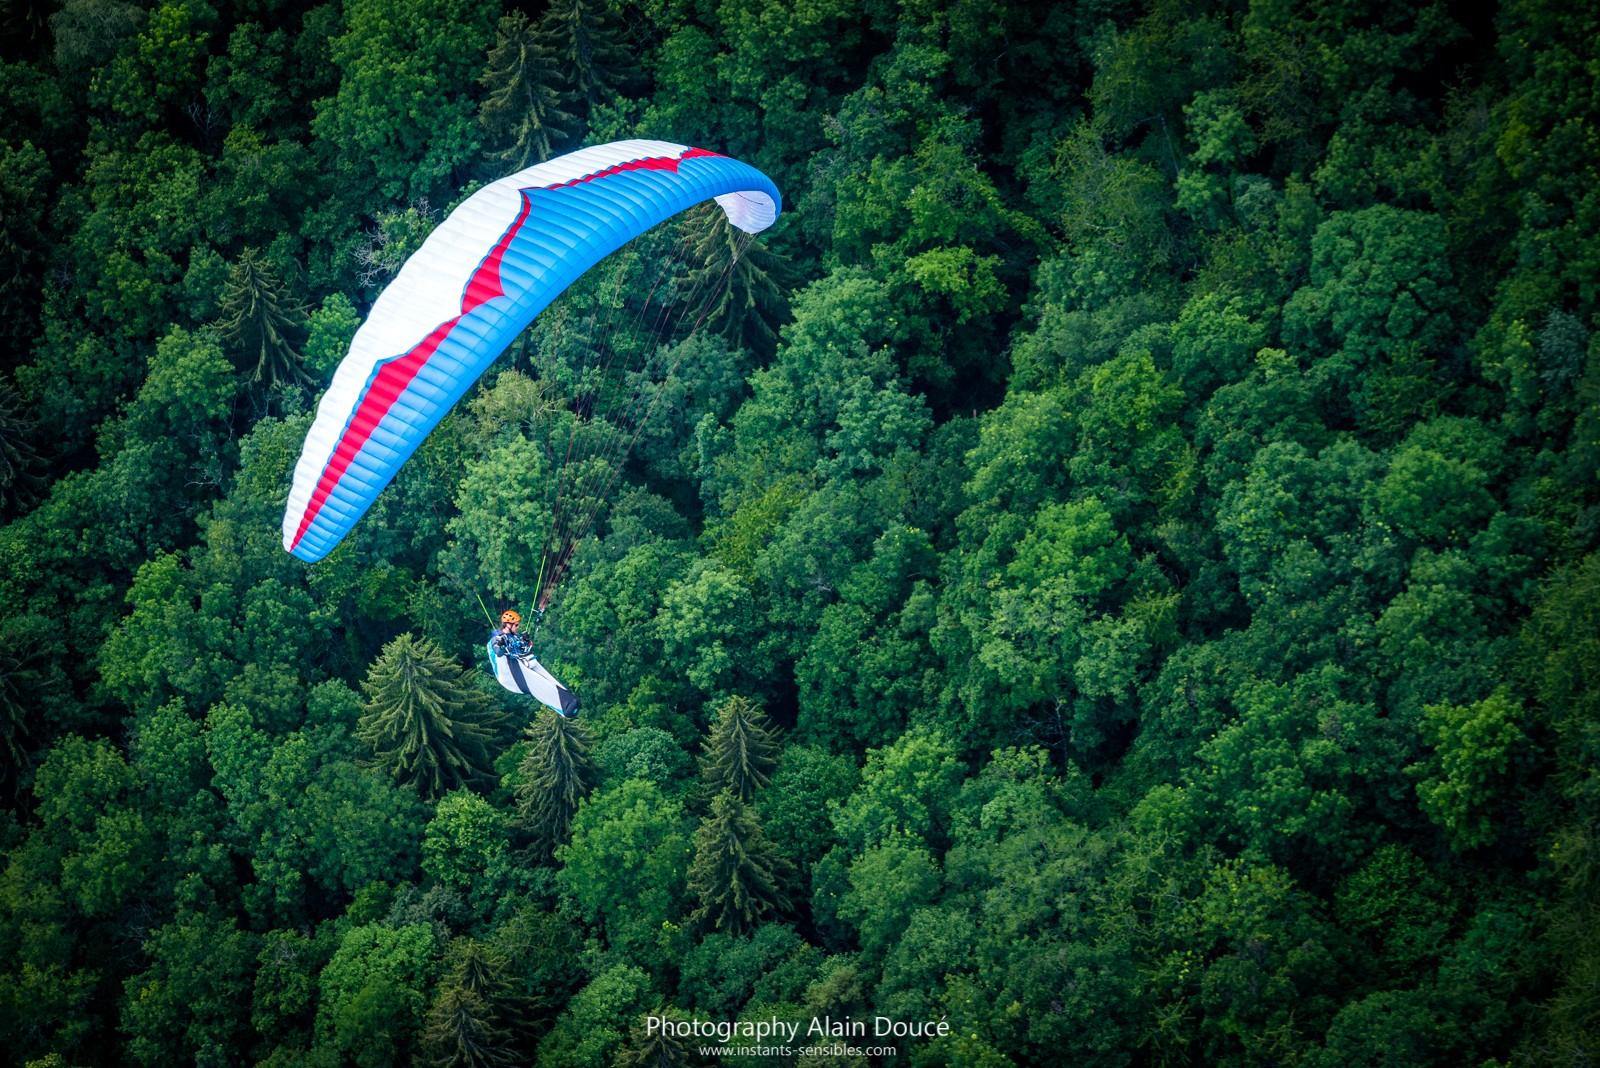 2018-06-16 Airtour2018 J7 BD Photo Alain Doucé-34